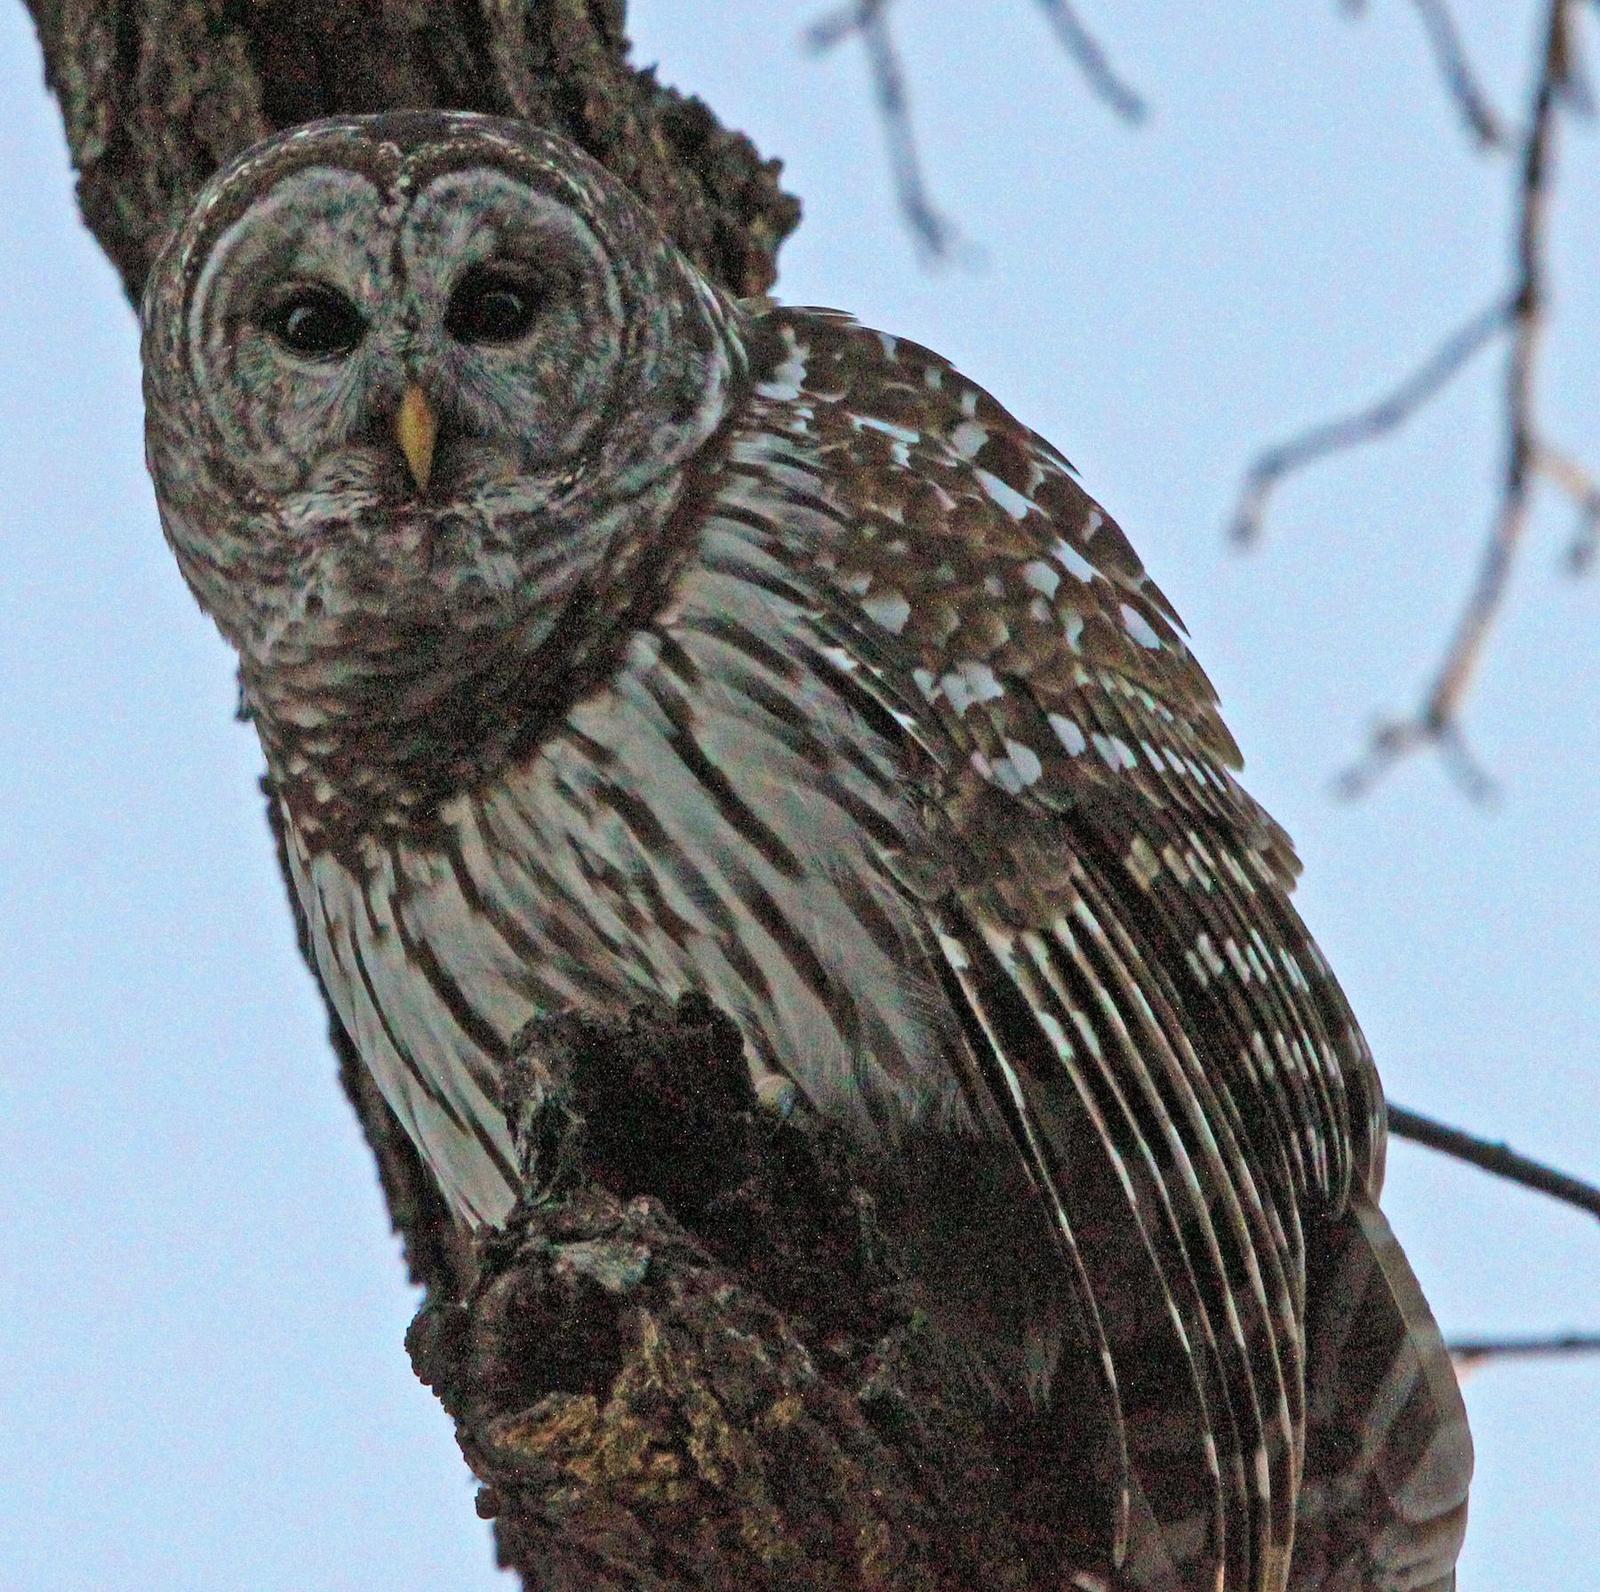 Barred Owl Photo by Tom Gannon